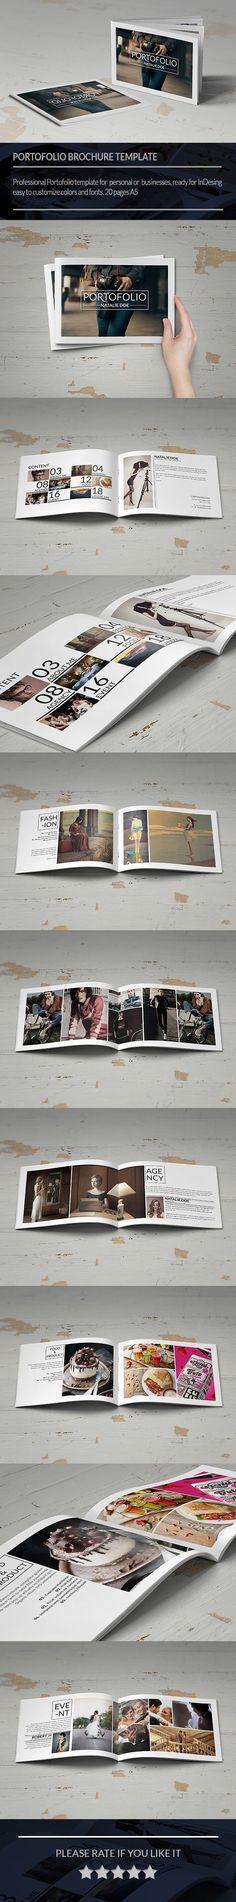 Photography Portofolio on Behance: